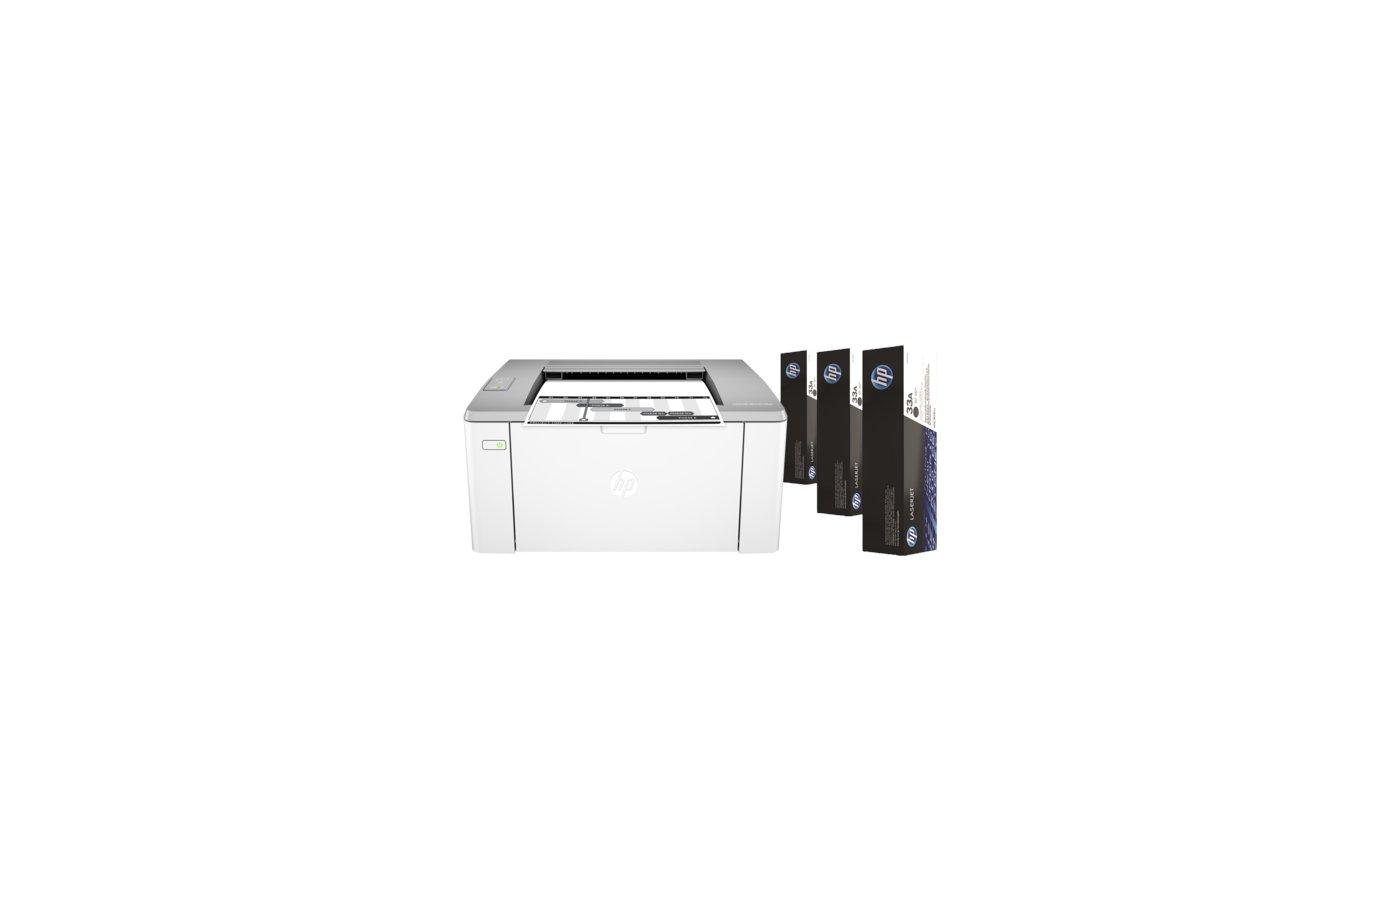 Принтер HP LaserJet Ultra M106w /G3Q39A/